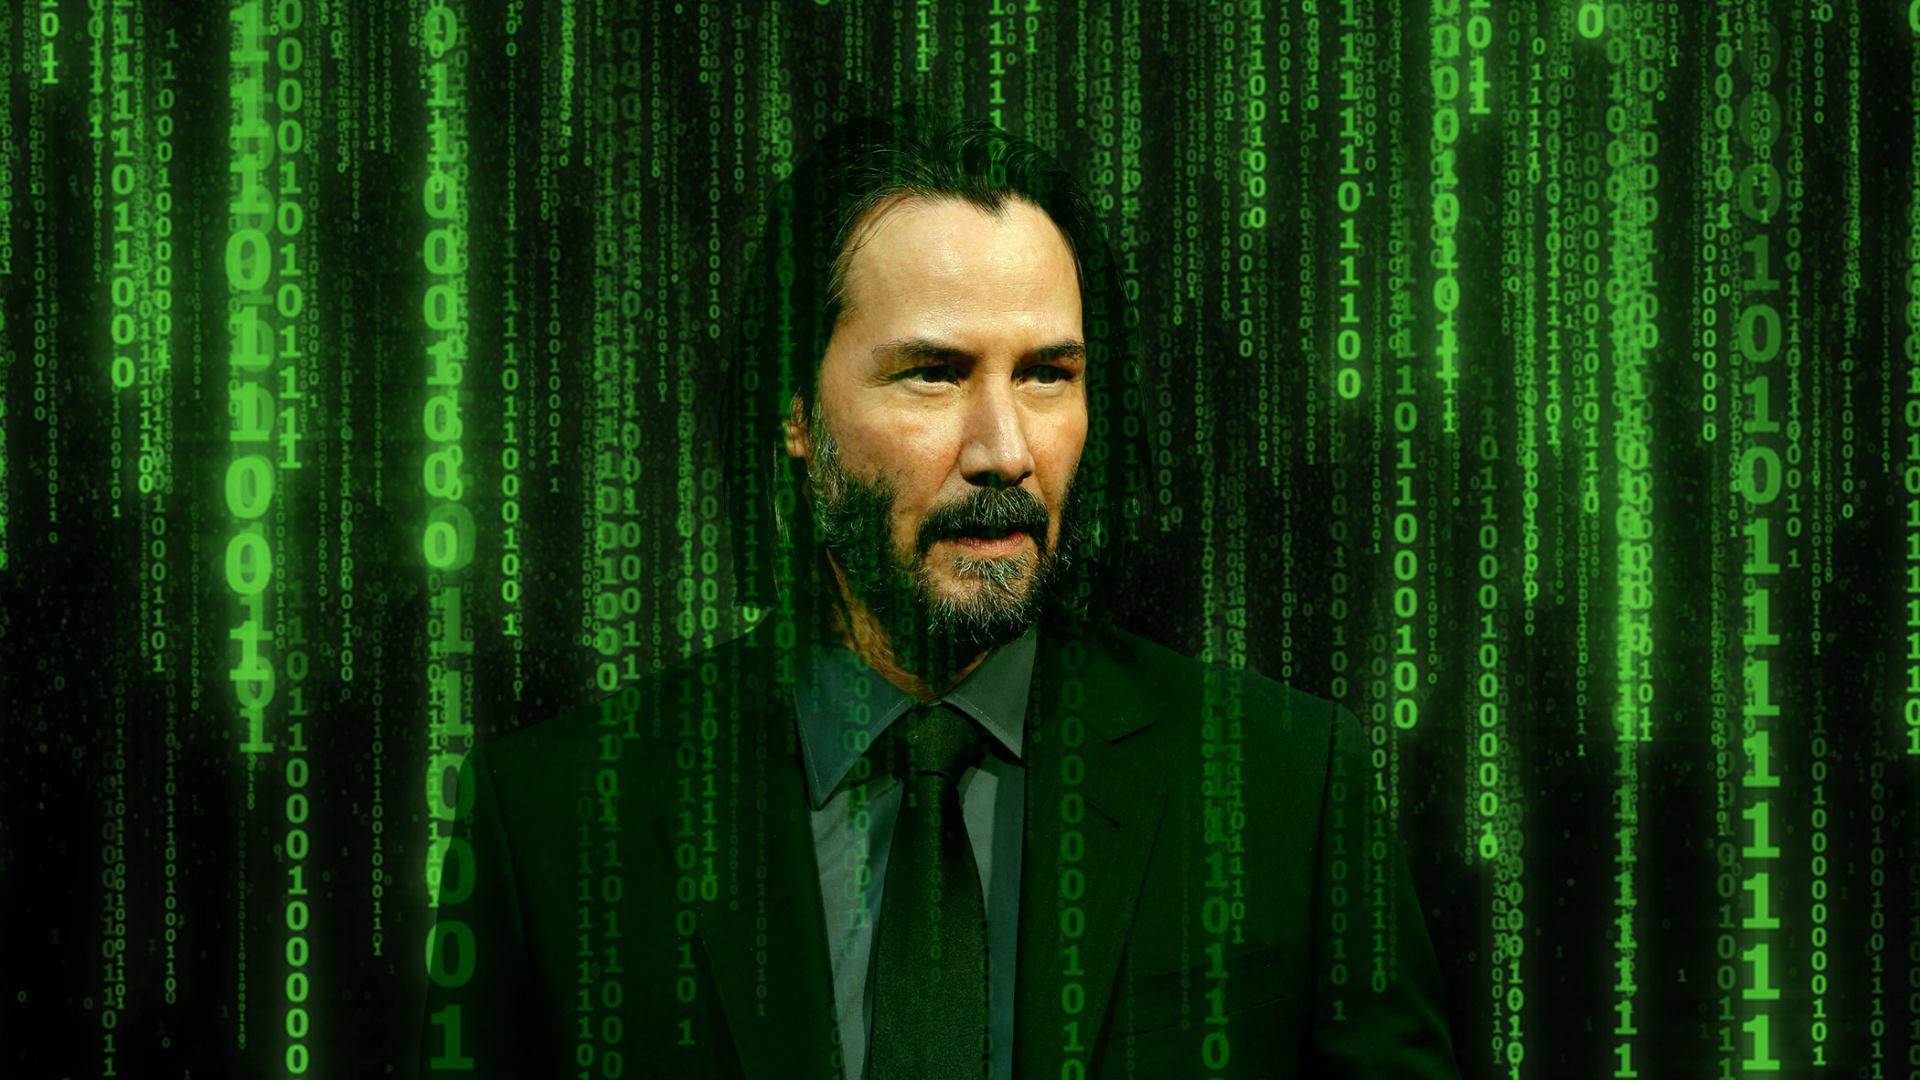 The Matrix 4 free photo